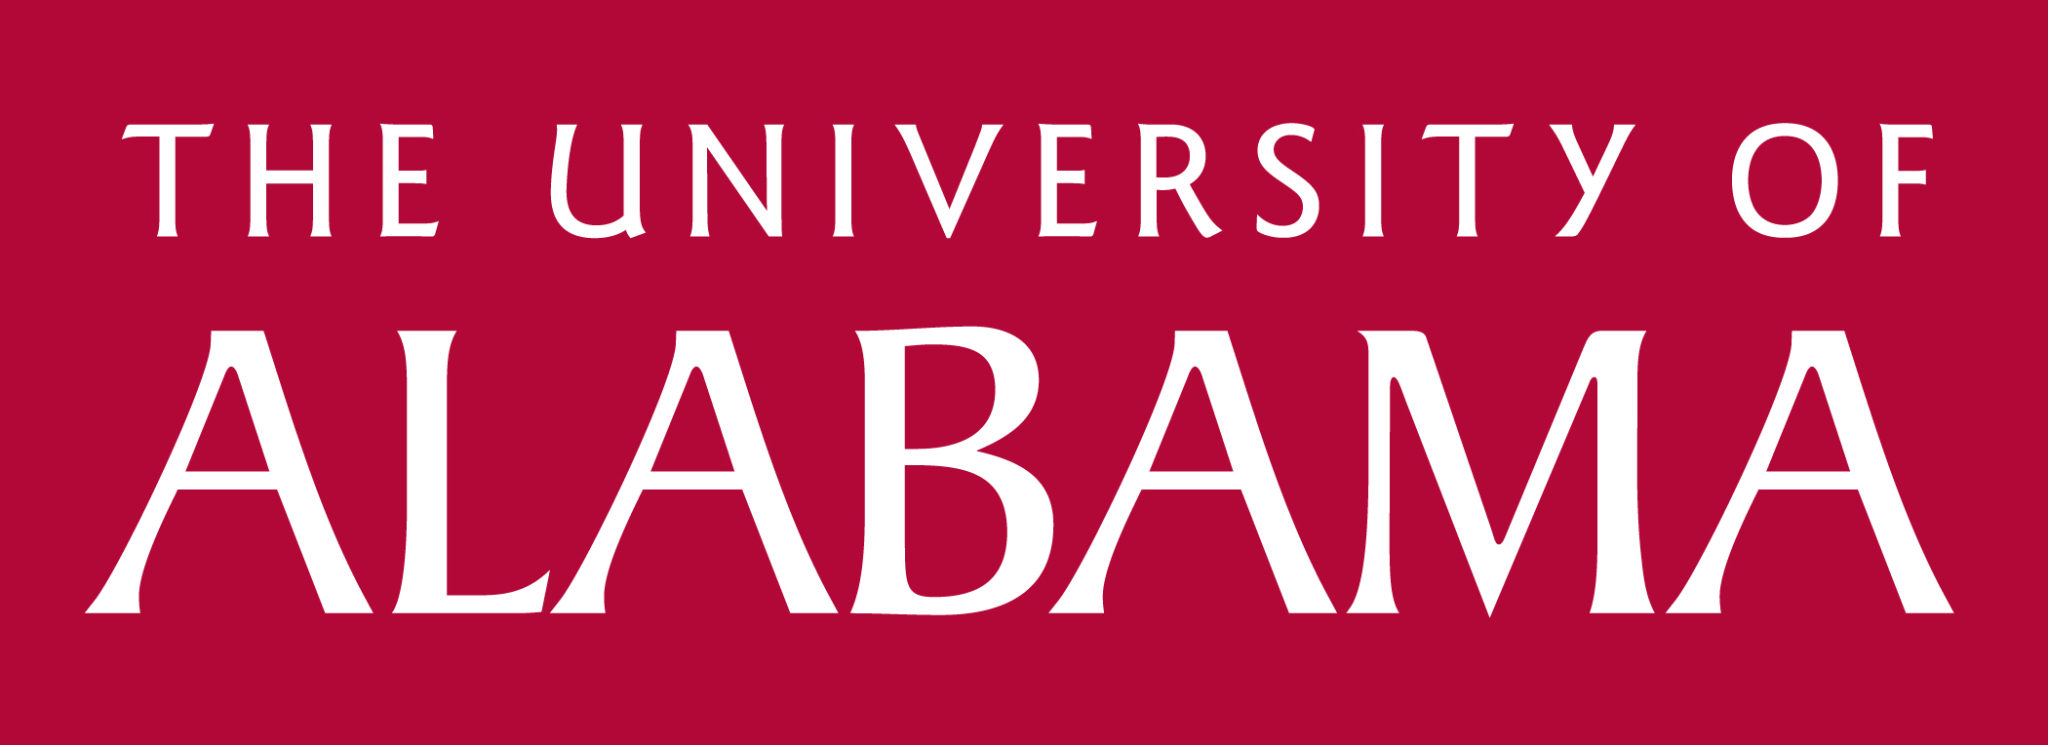 University of Alabama MS in Marketing, specialization in Marketing Analytics